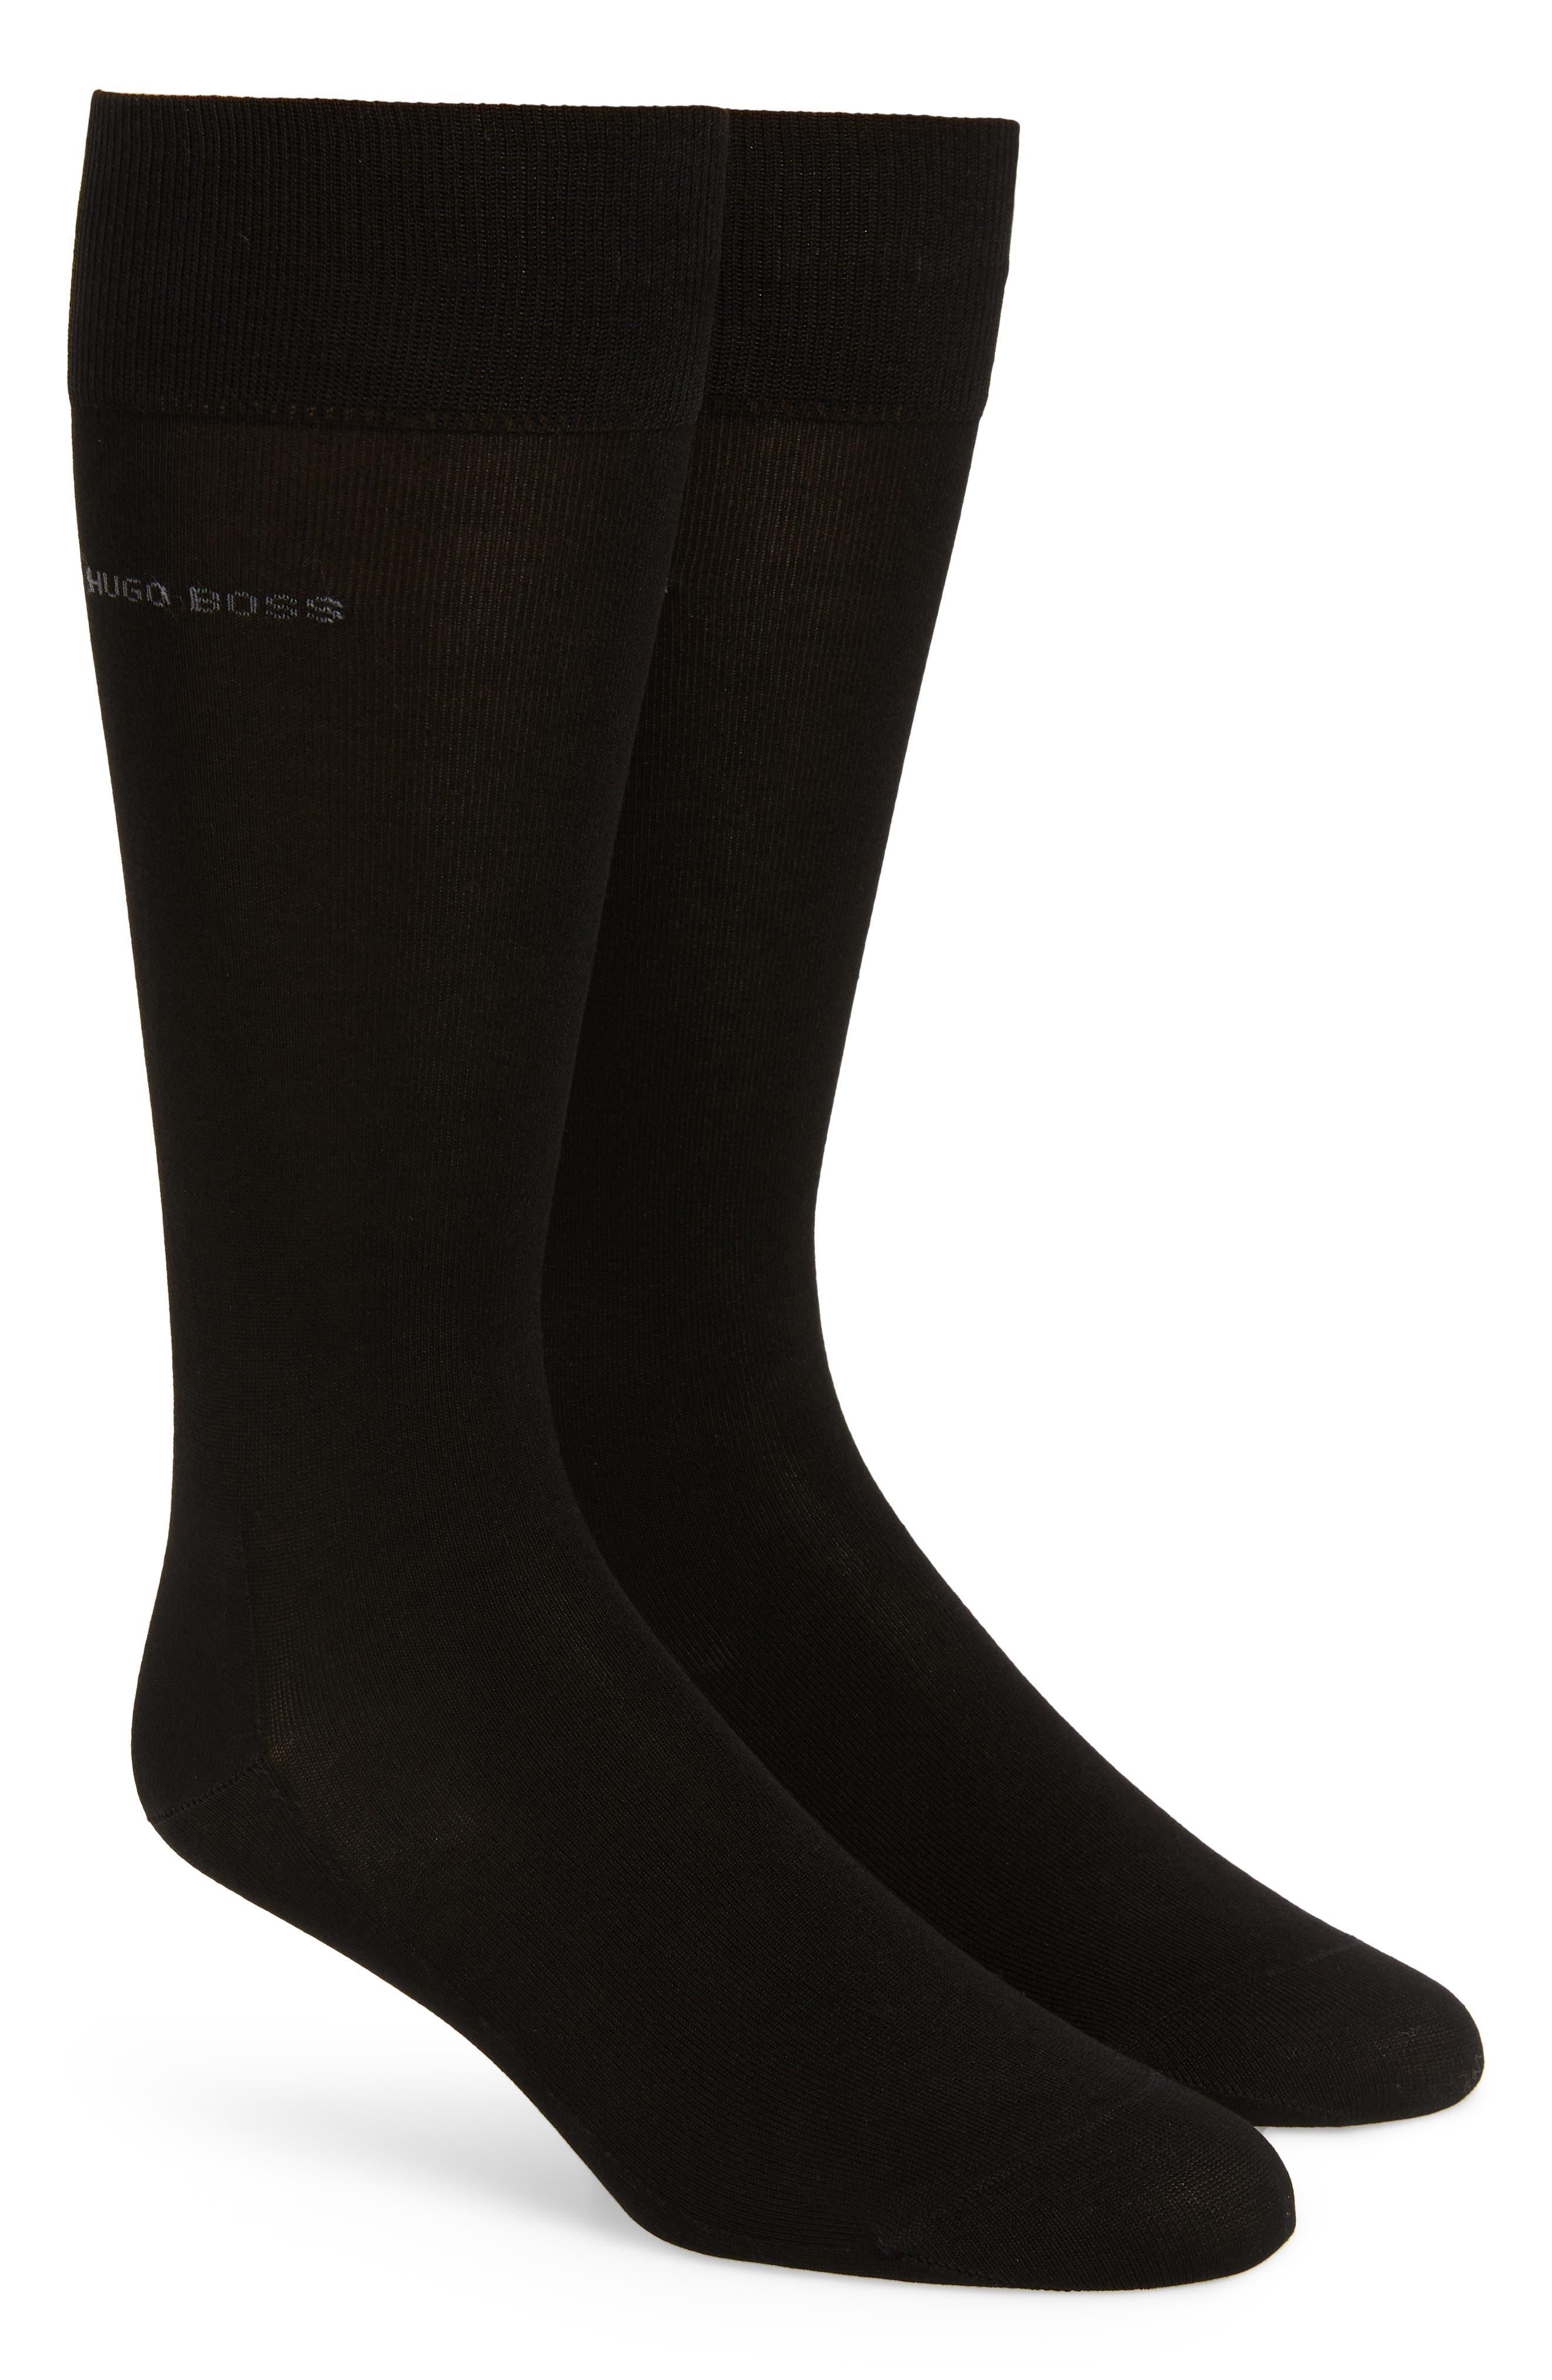 2-Pack Solid Socks,                             Main thumbnail 1, color,                             BLACK